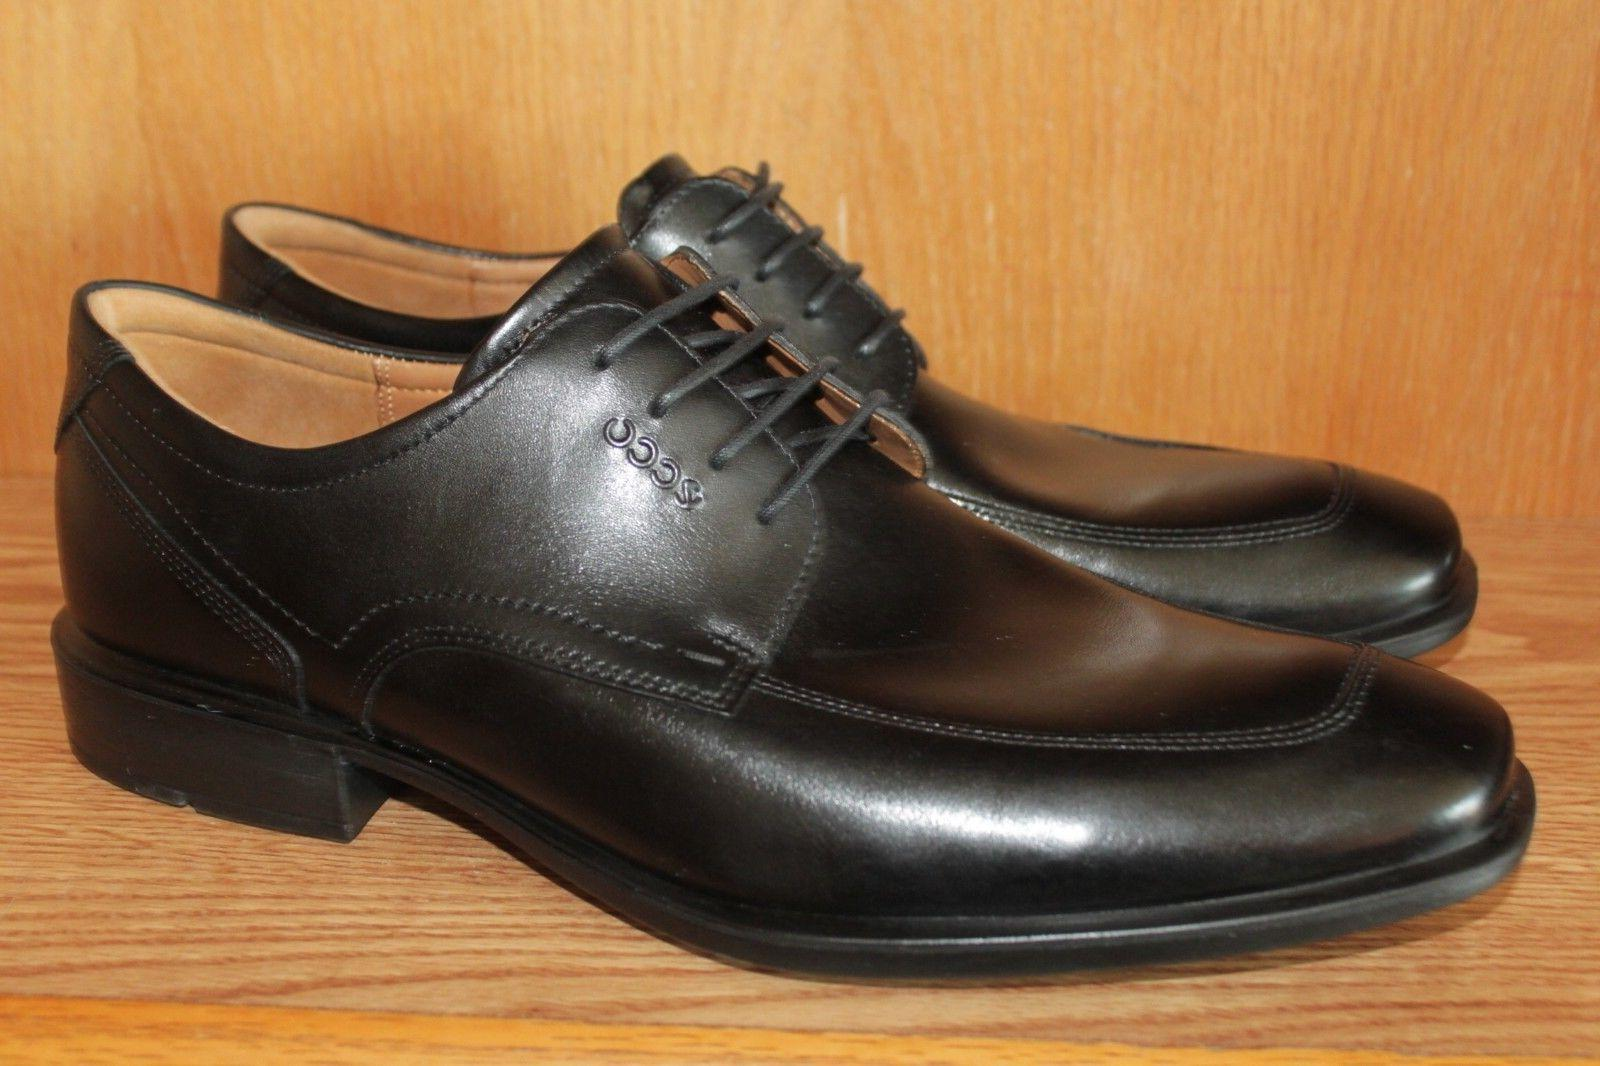 brand new cairo apron toe black leather